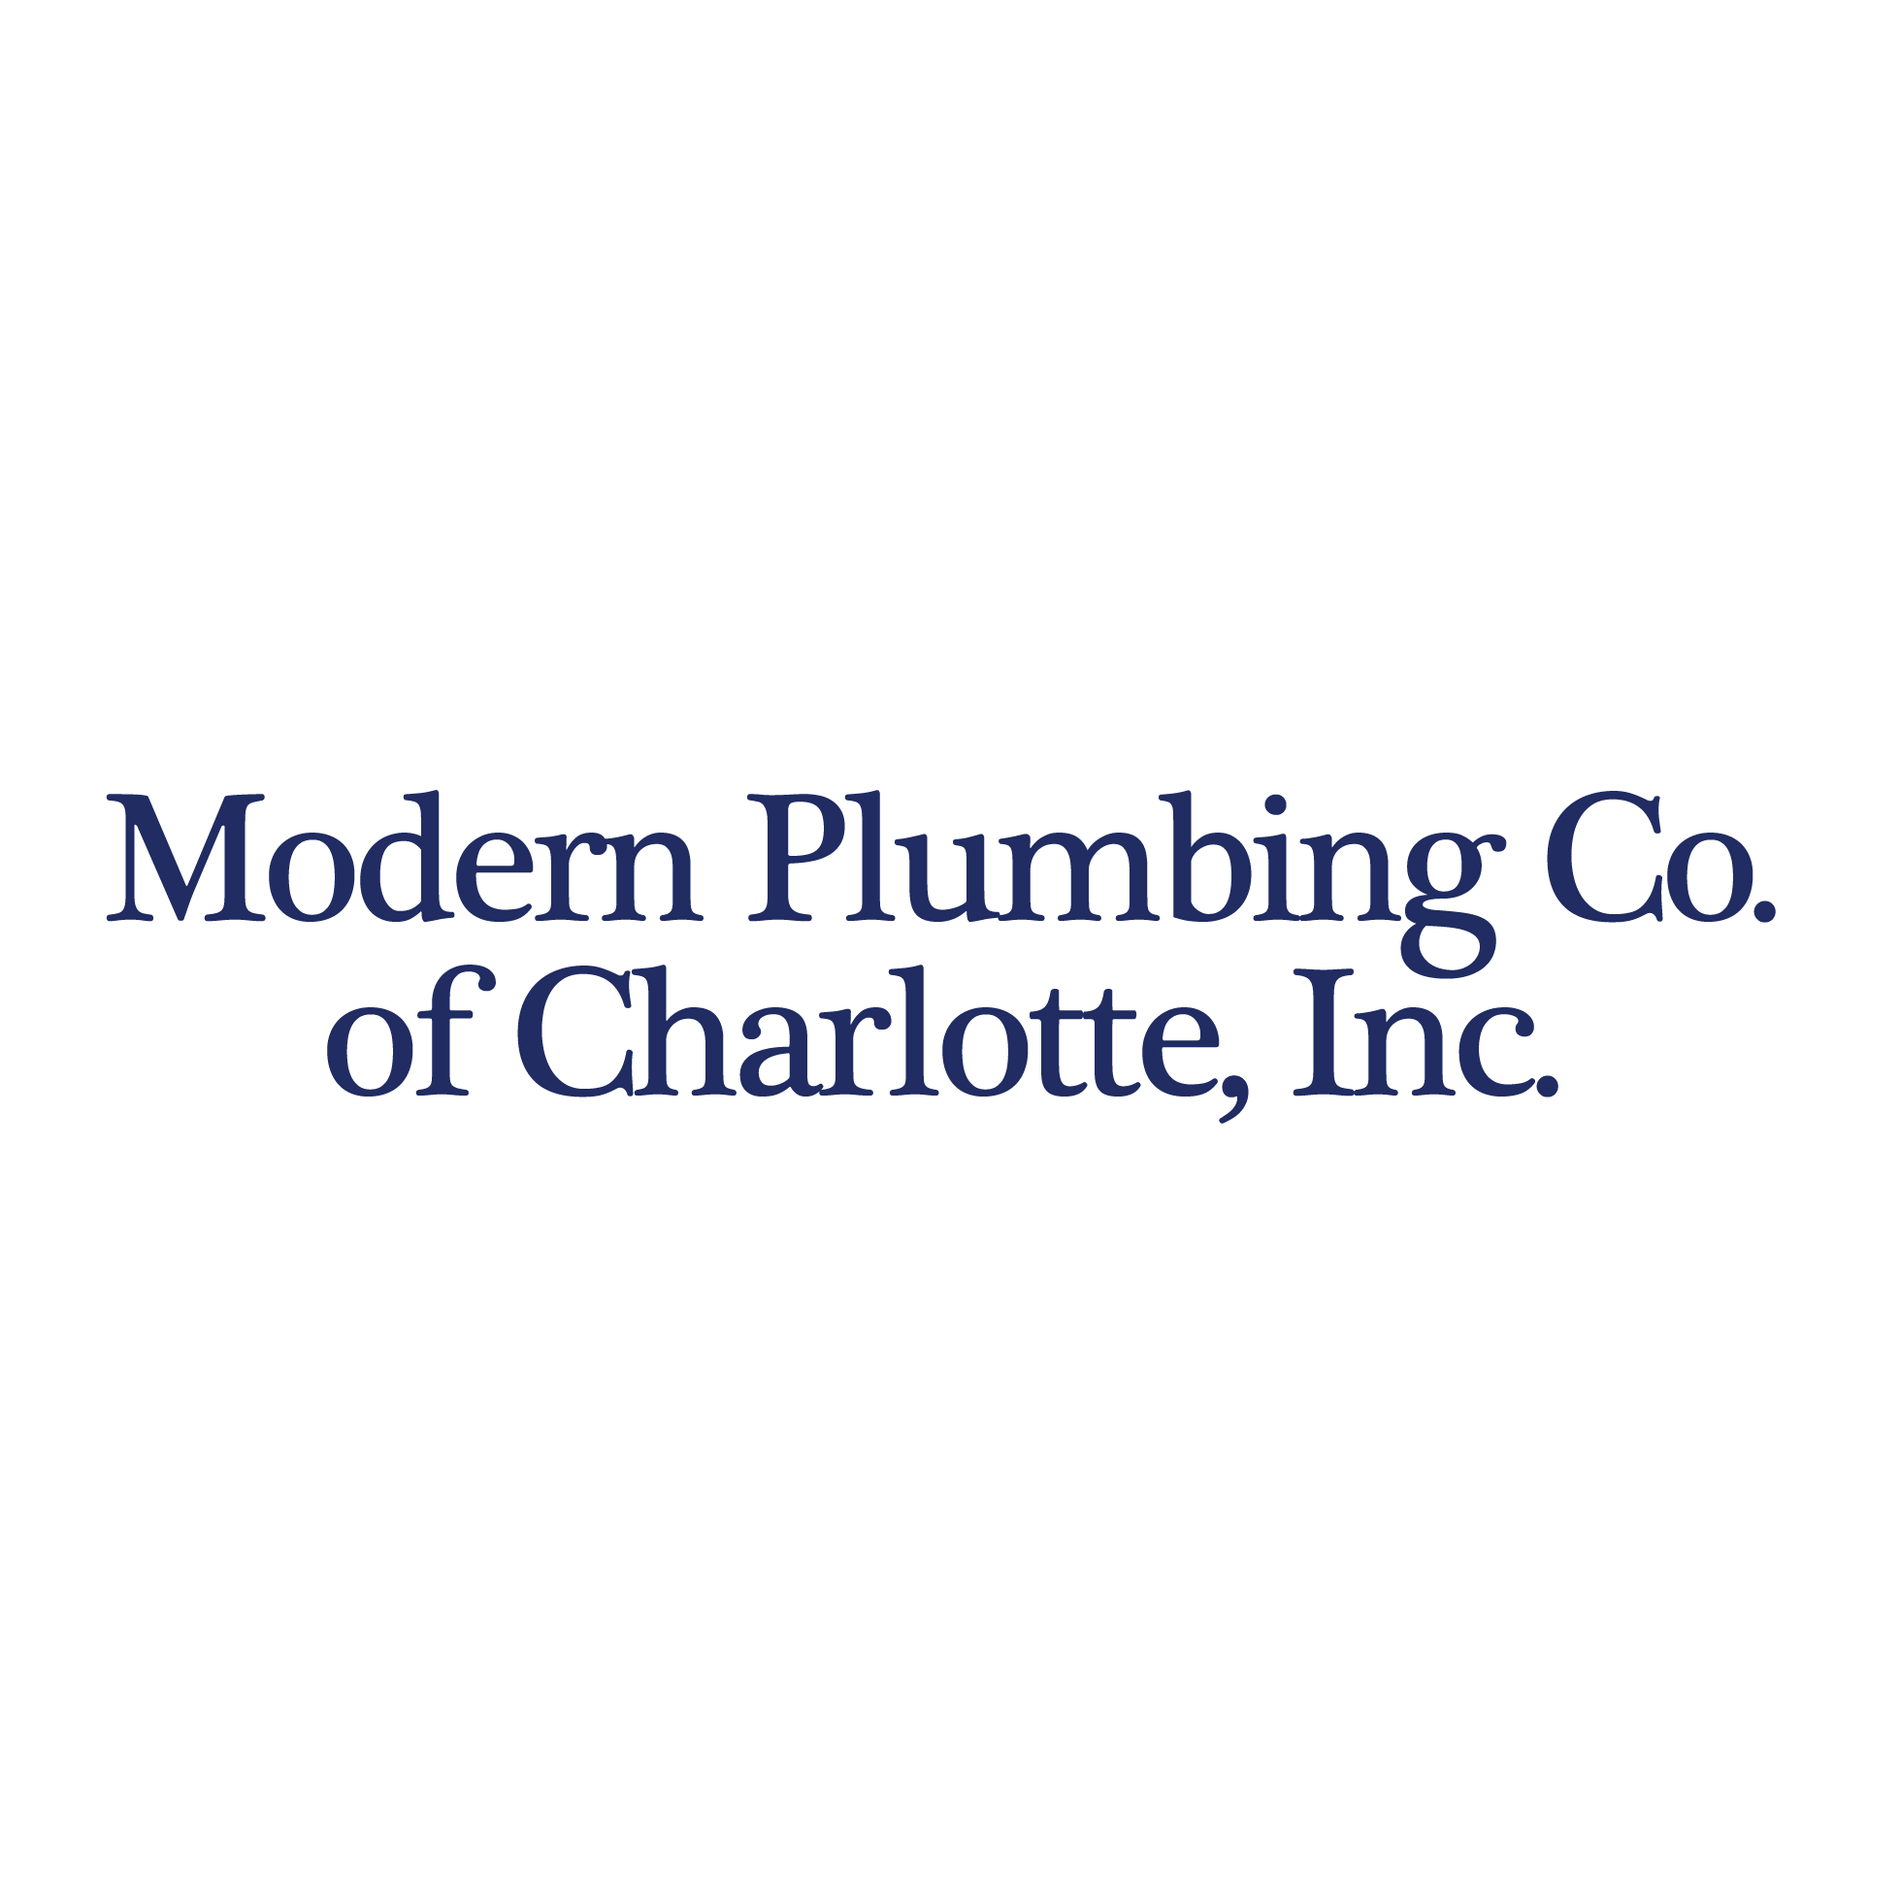 Modern Plumbing Co. of Charlotte, Inc.